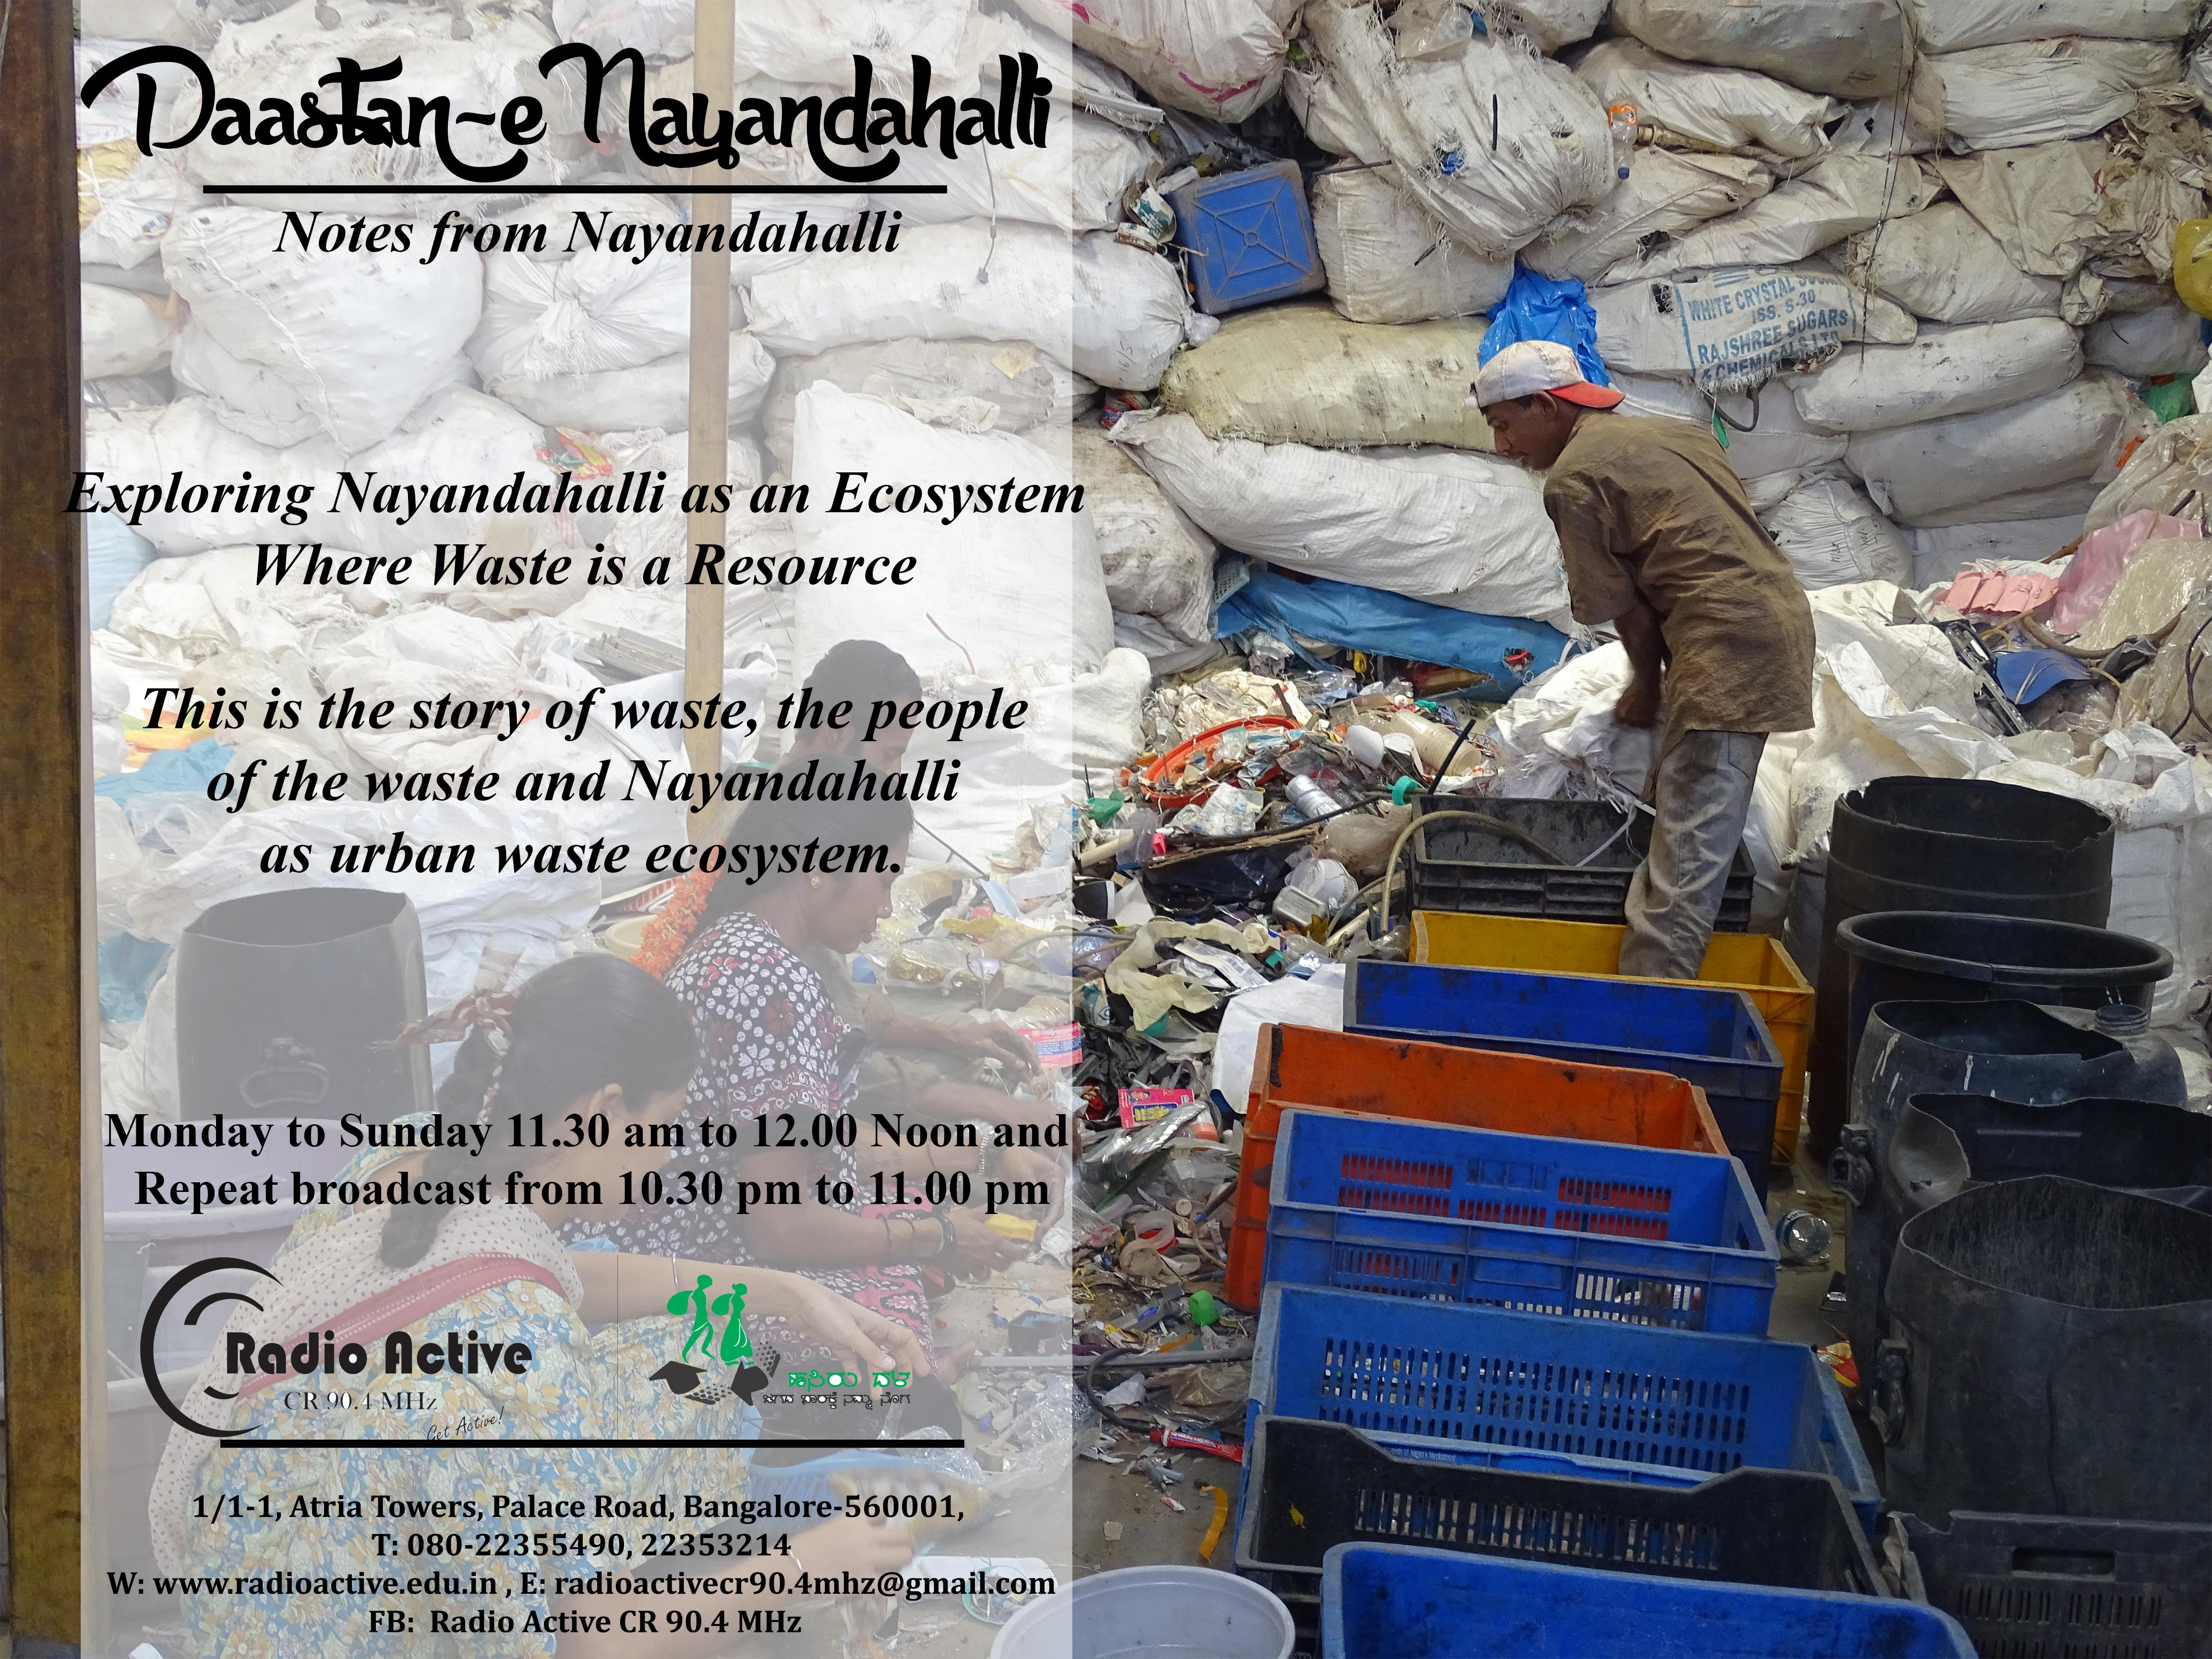 nayandalli-poster-3